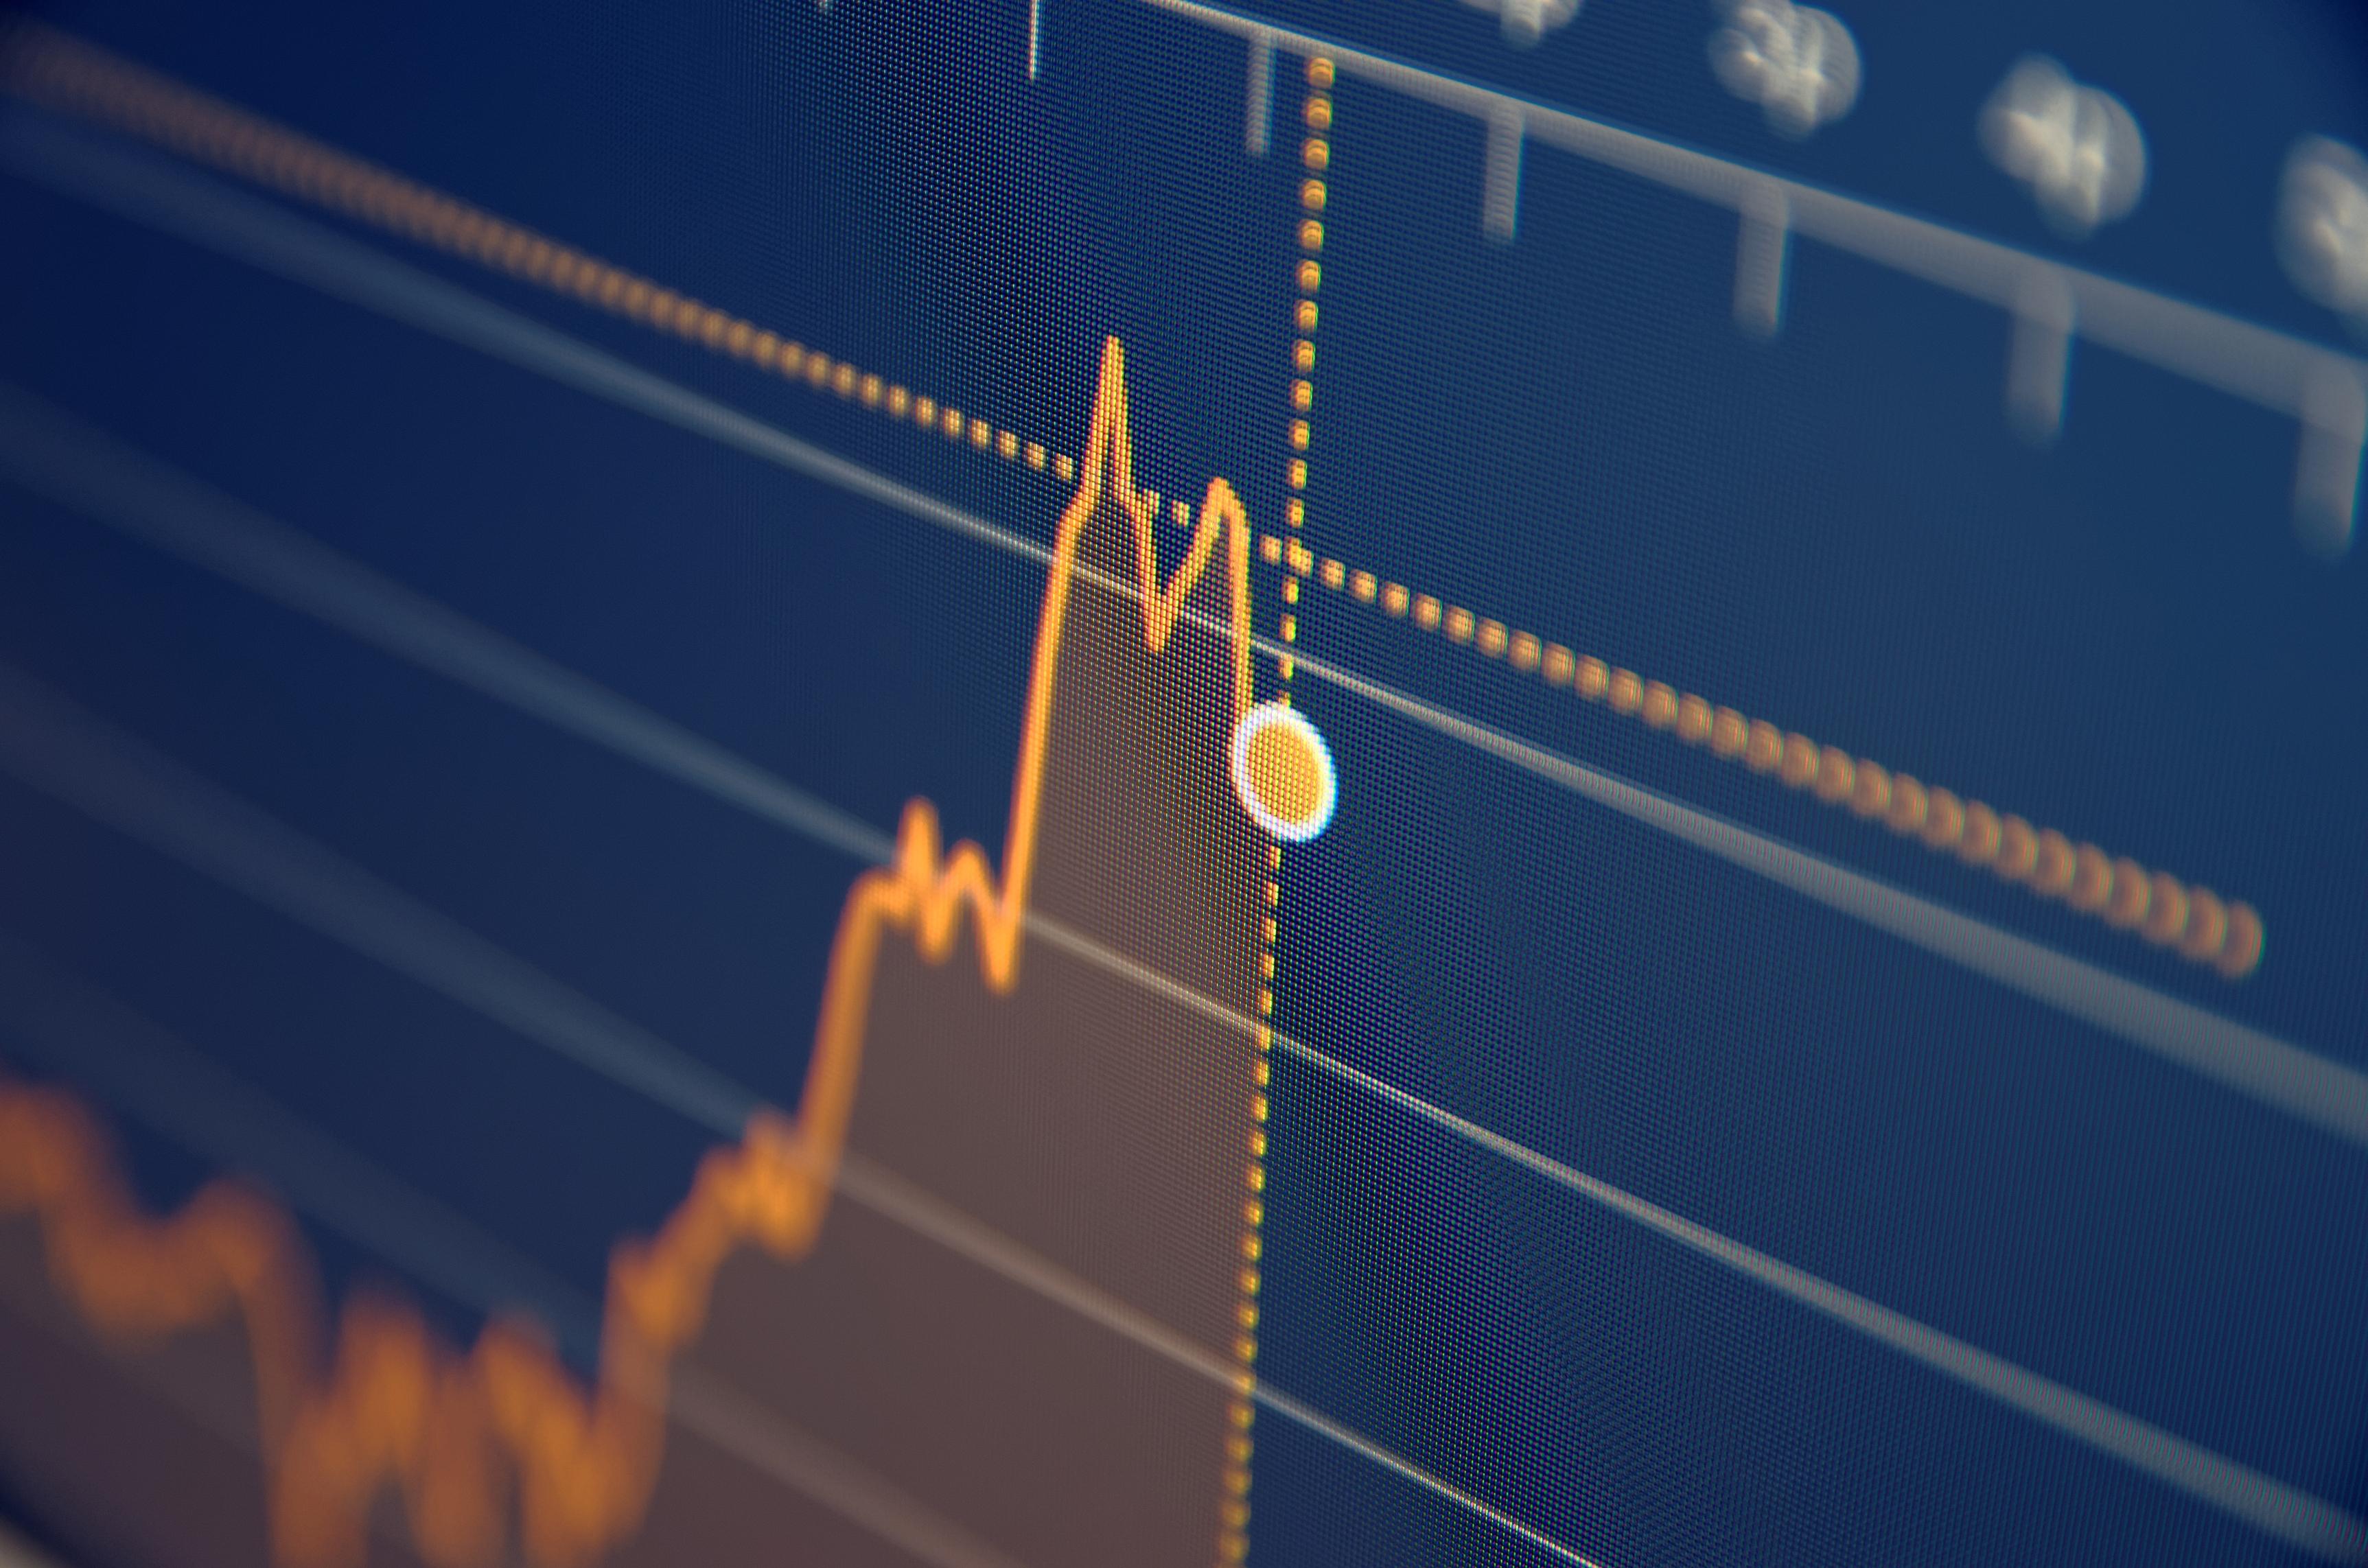 Blue and orange rising stock chart